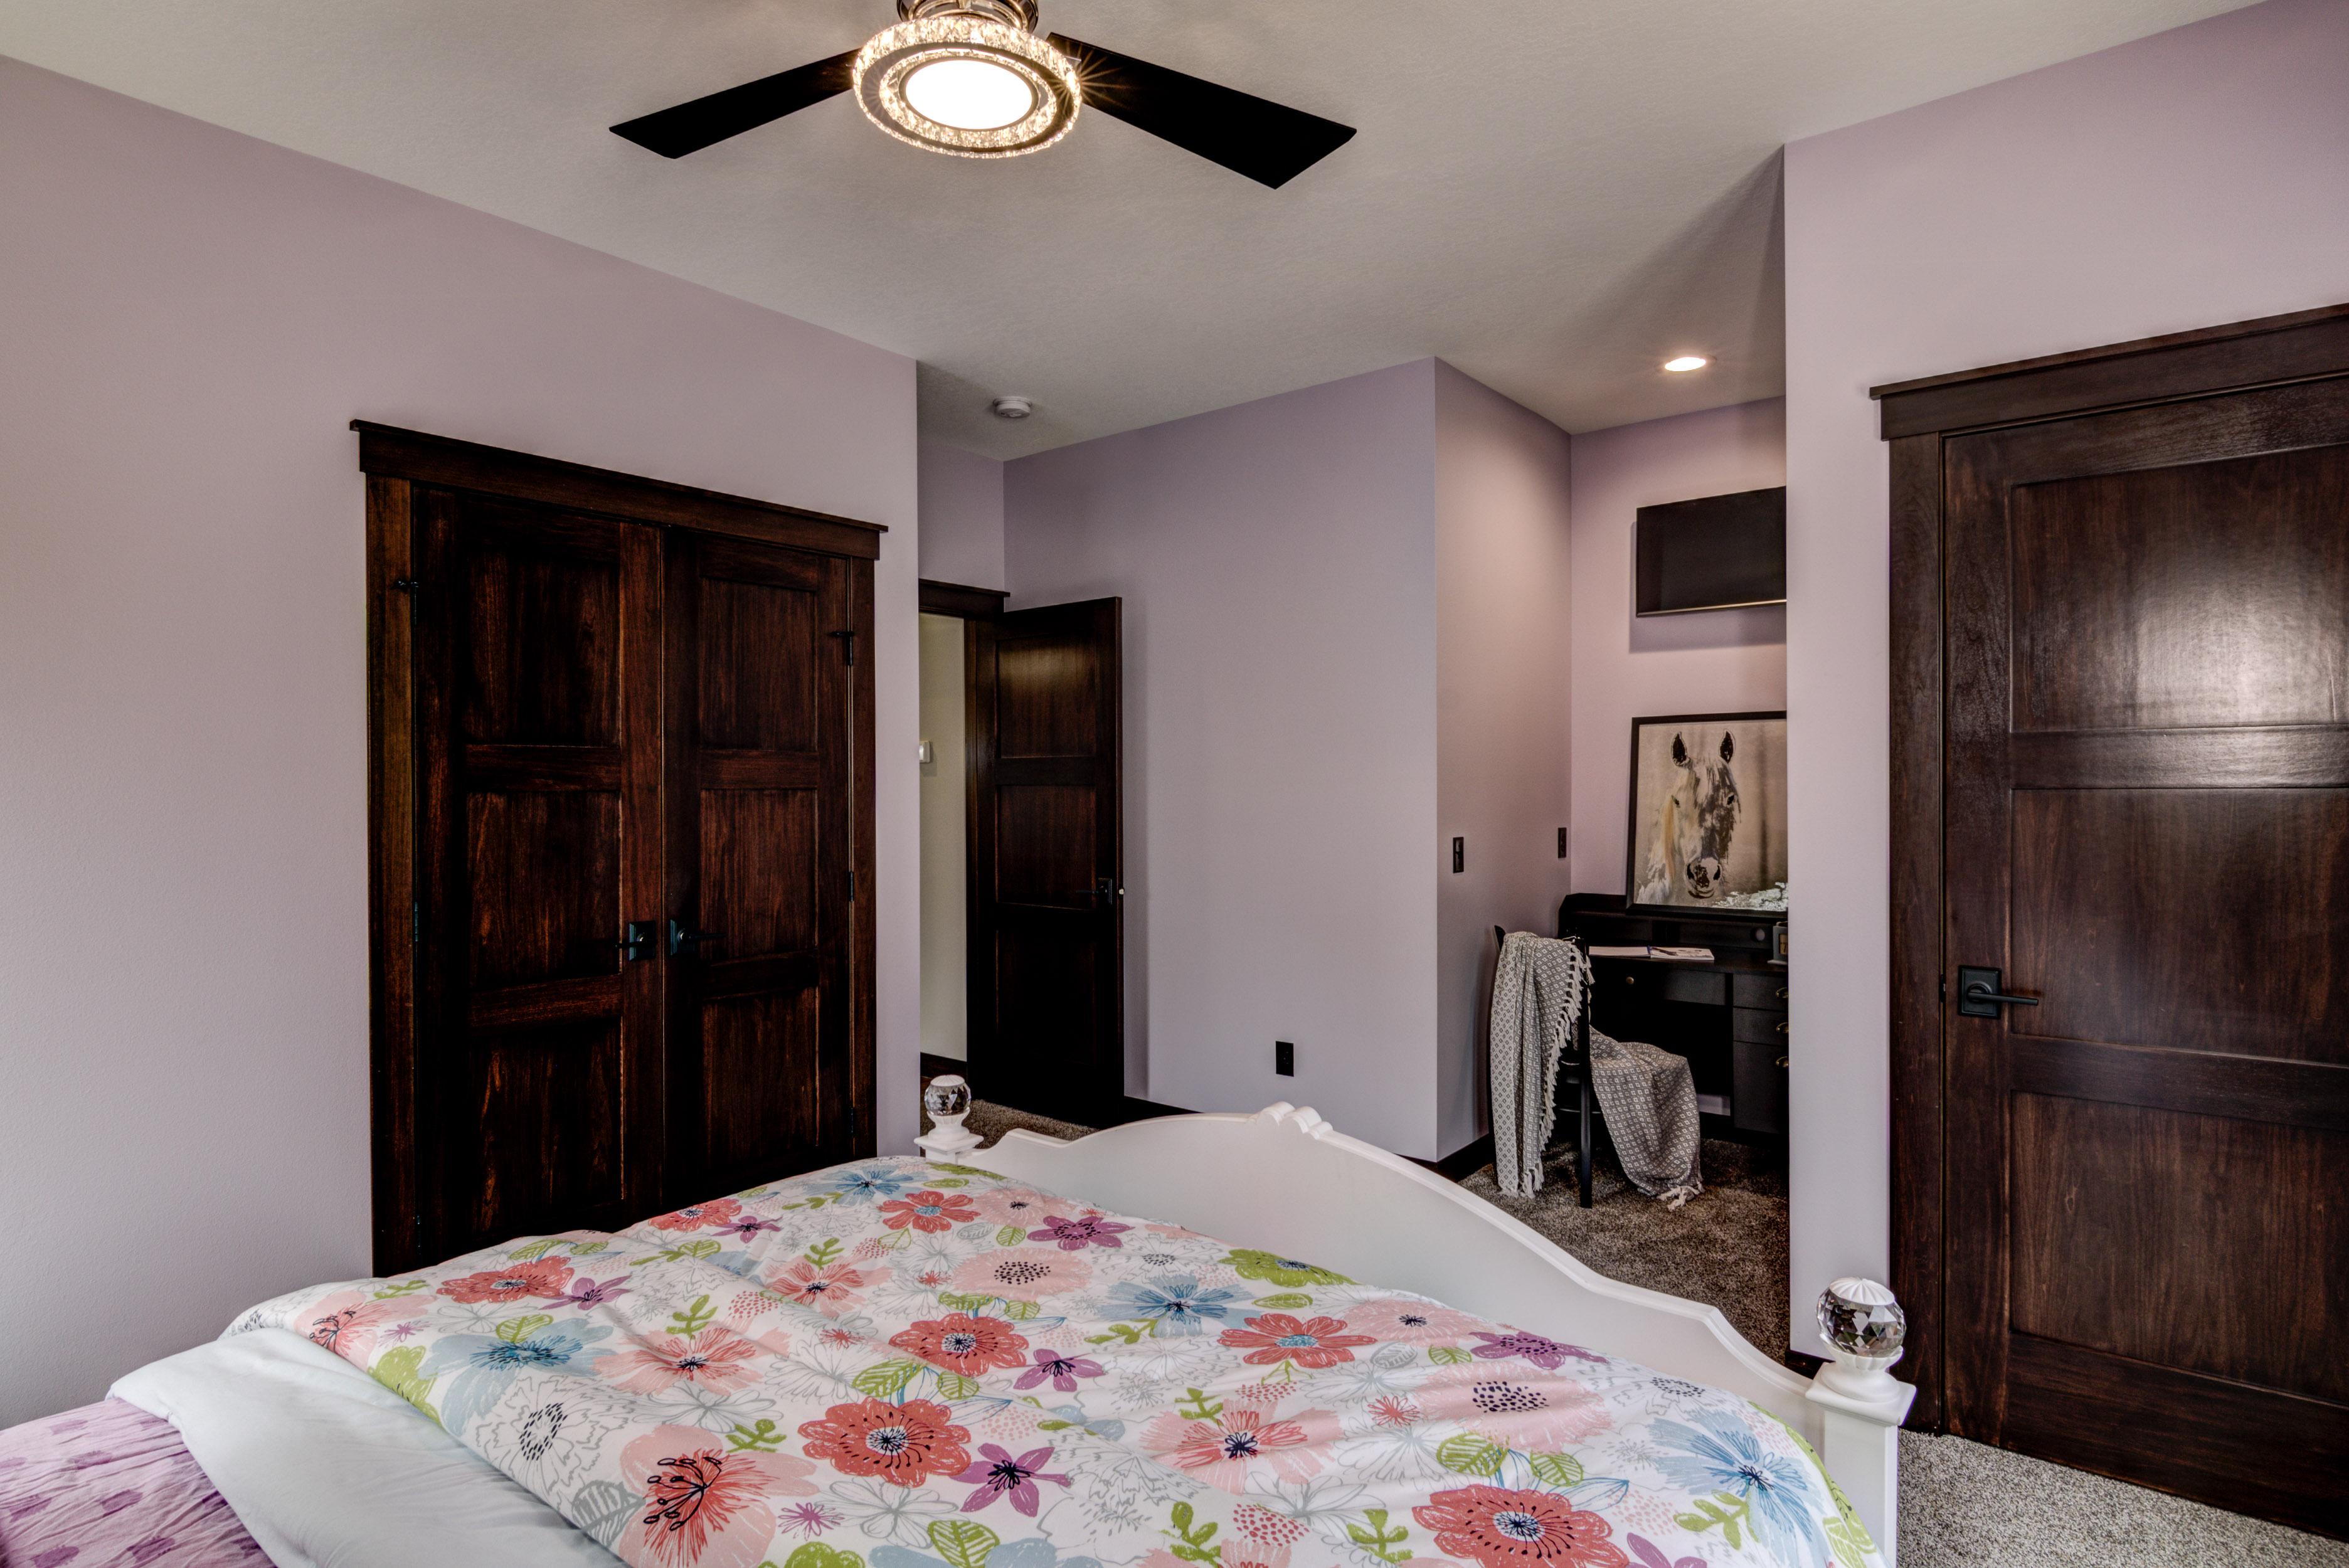 35-10 - Main Level Bedroom - 2-2